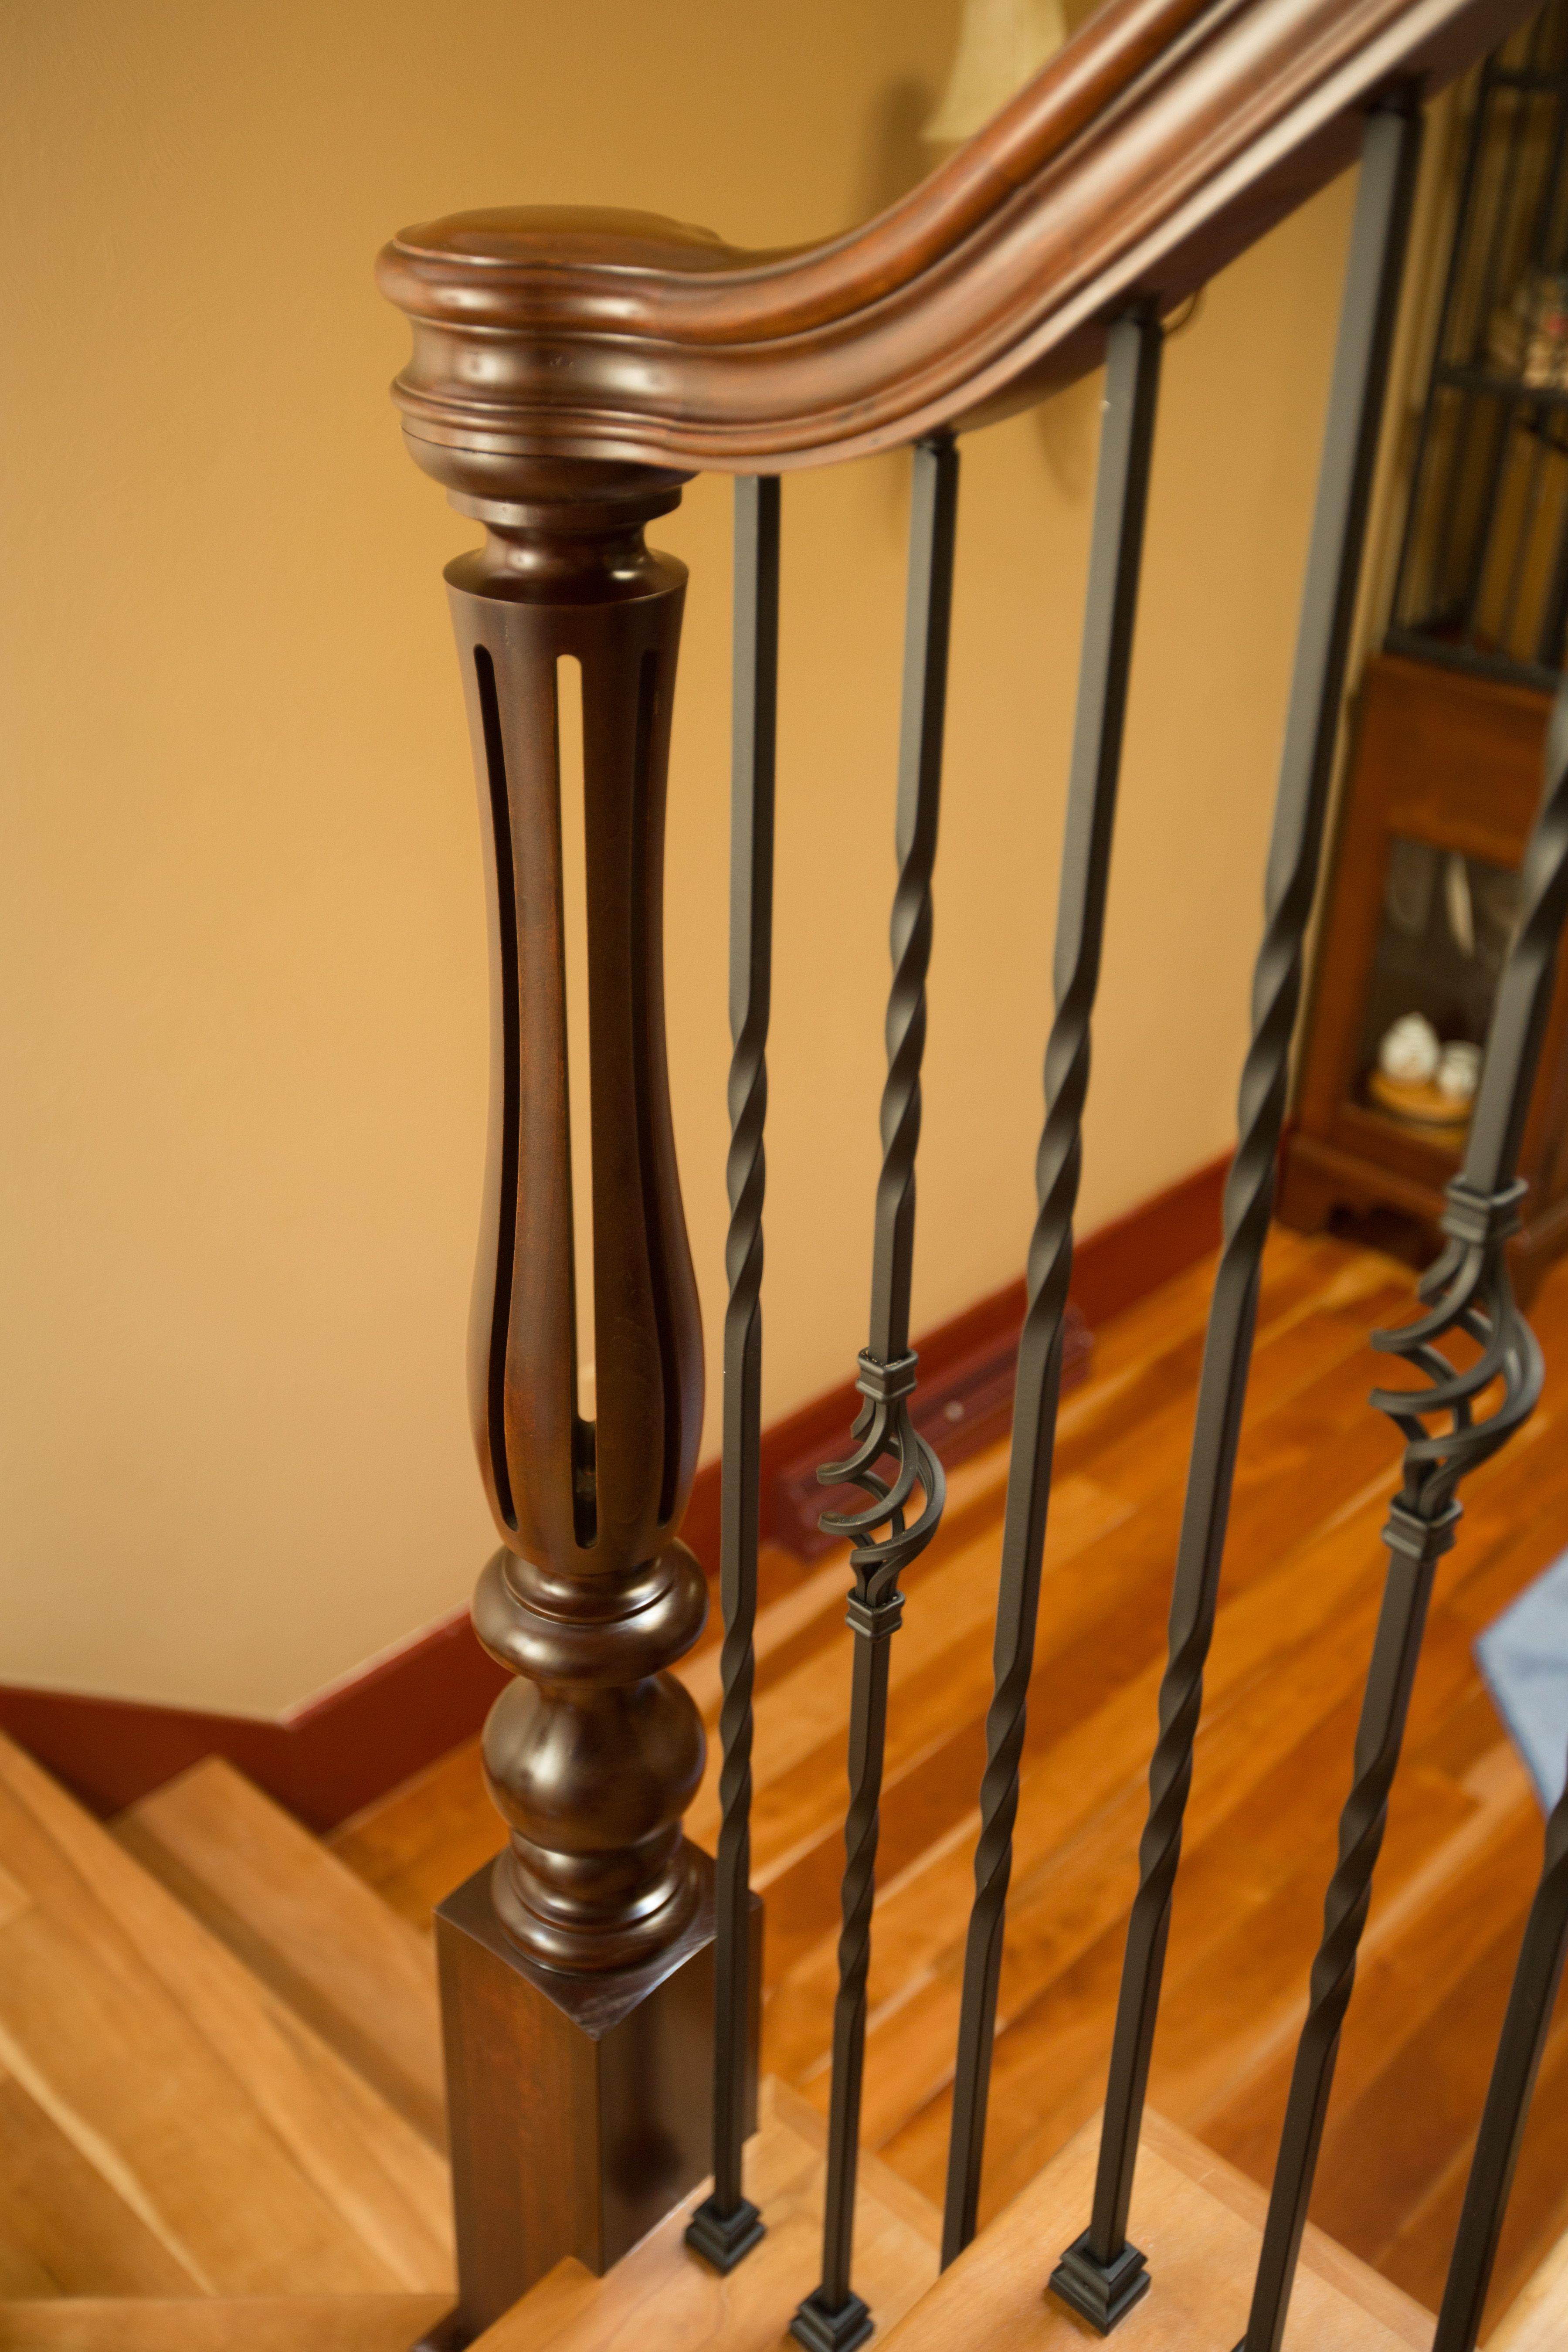 Turned Newel Posts Beautiful Newel Posts For Stairways | Turned Newel Post Designs | Type | Spiral | Round | Wood Baluster | Black